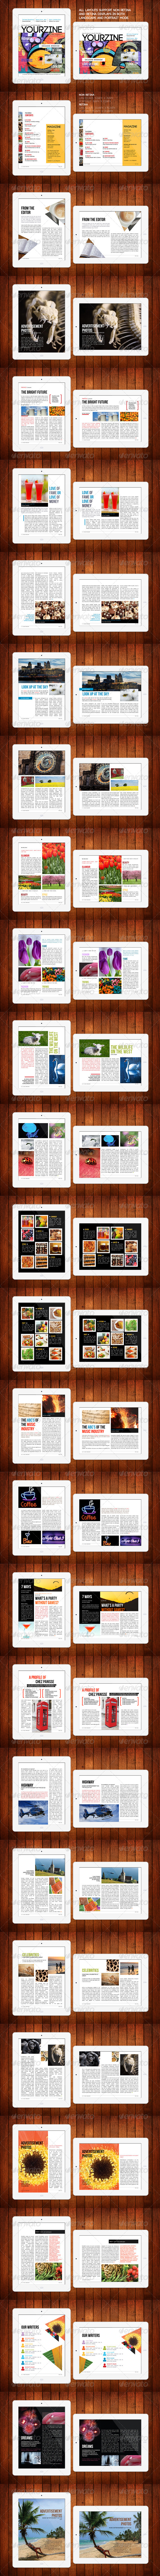 iPad Tablet Magazine Template 28 Pages - Digital Magazines ePublishing